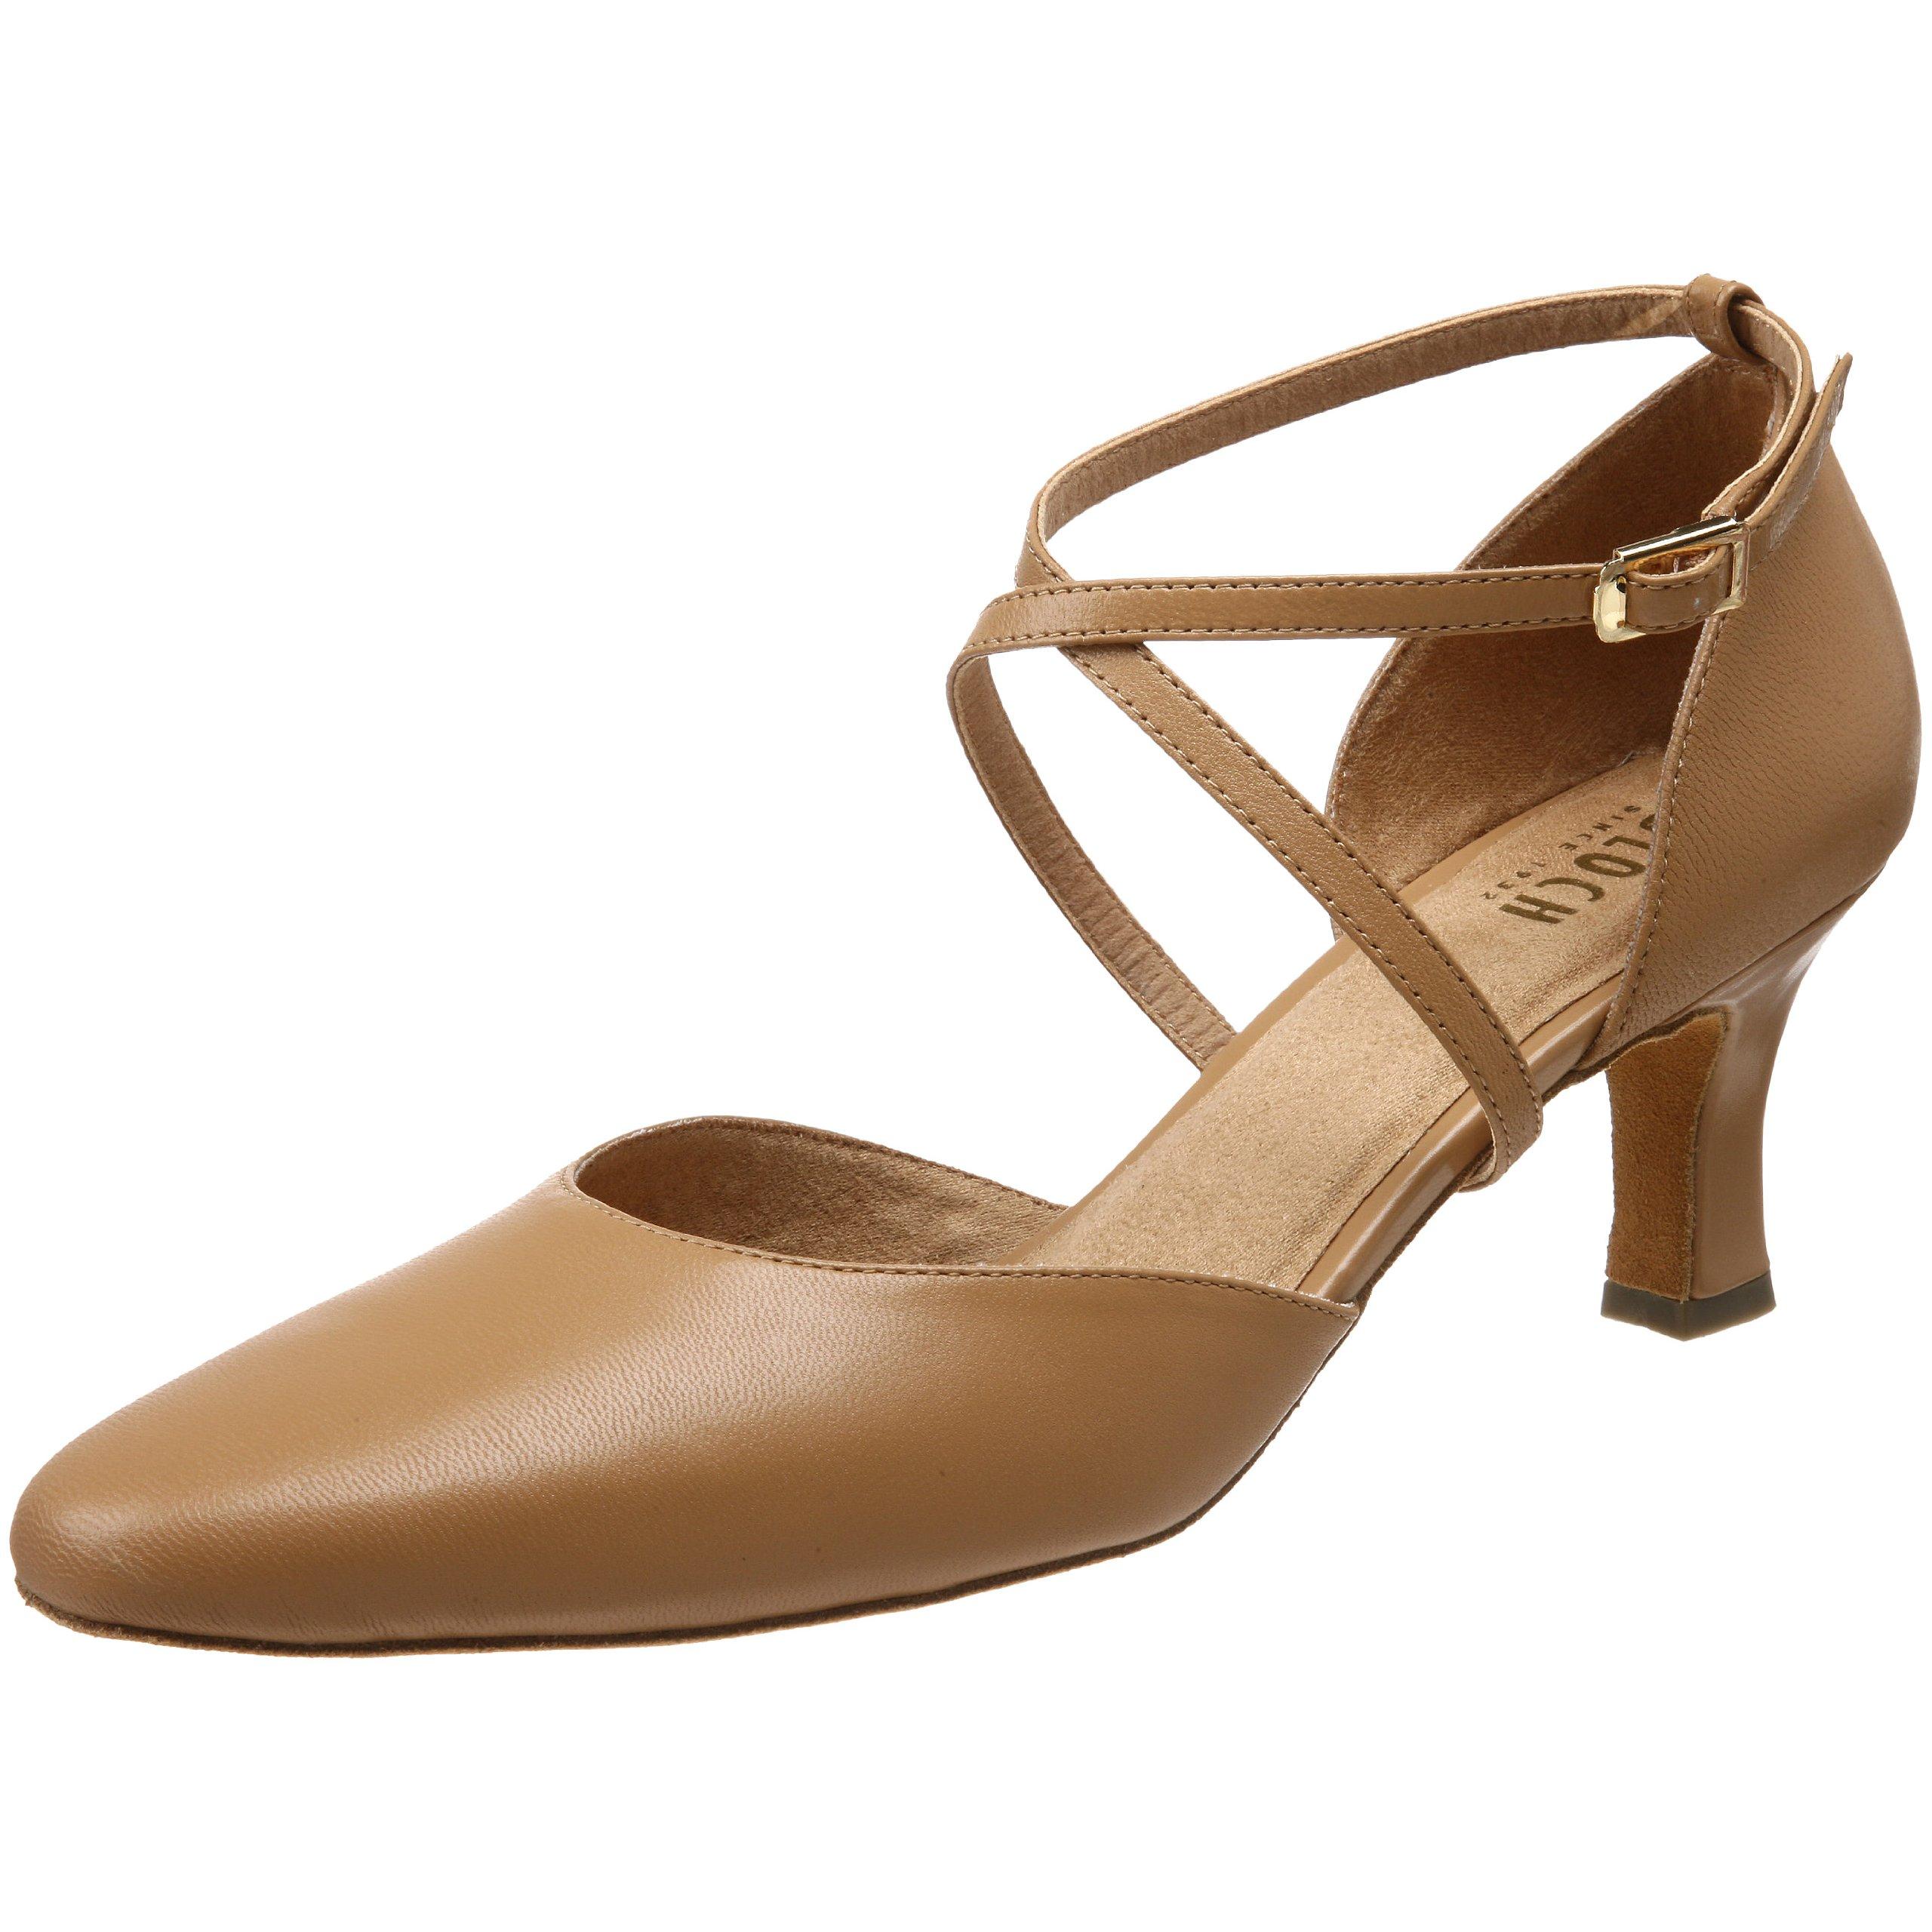 Bloch Women's Simona Ballroom Shoe,Natural,9.5 X(Medium) US